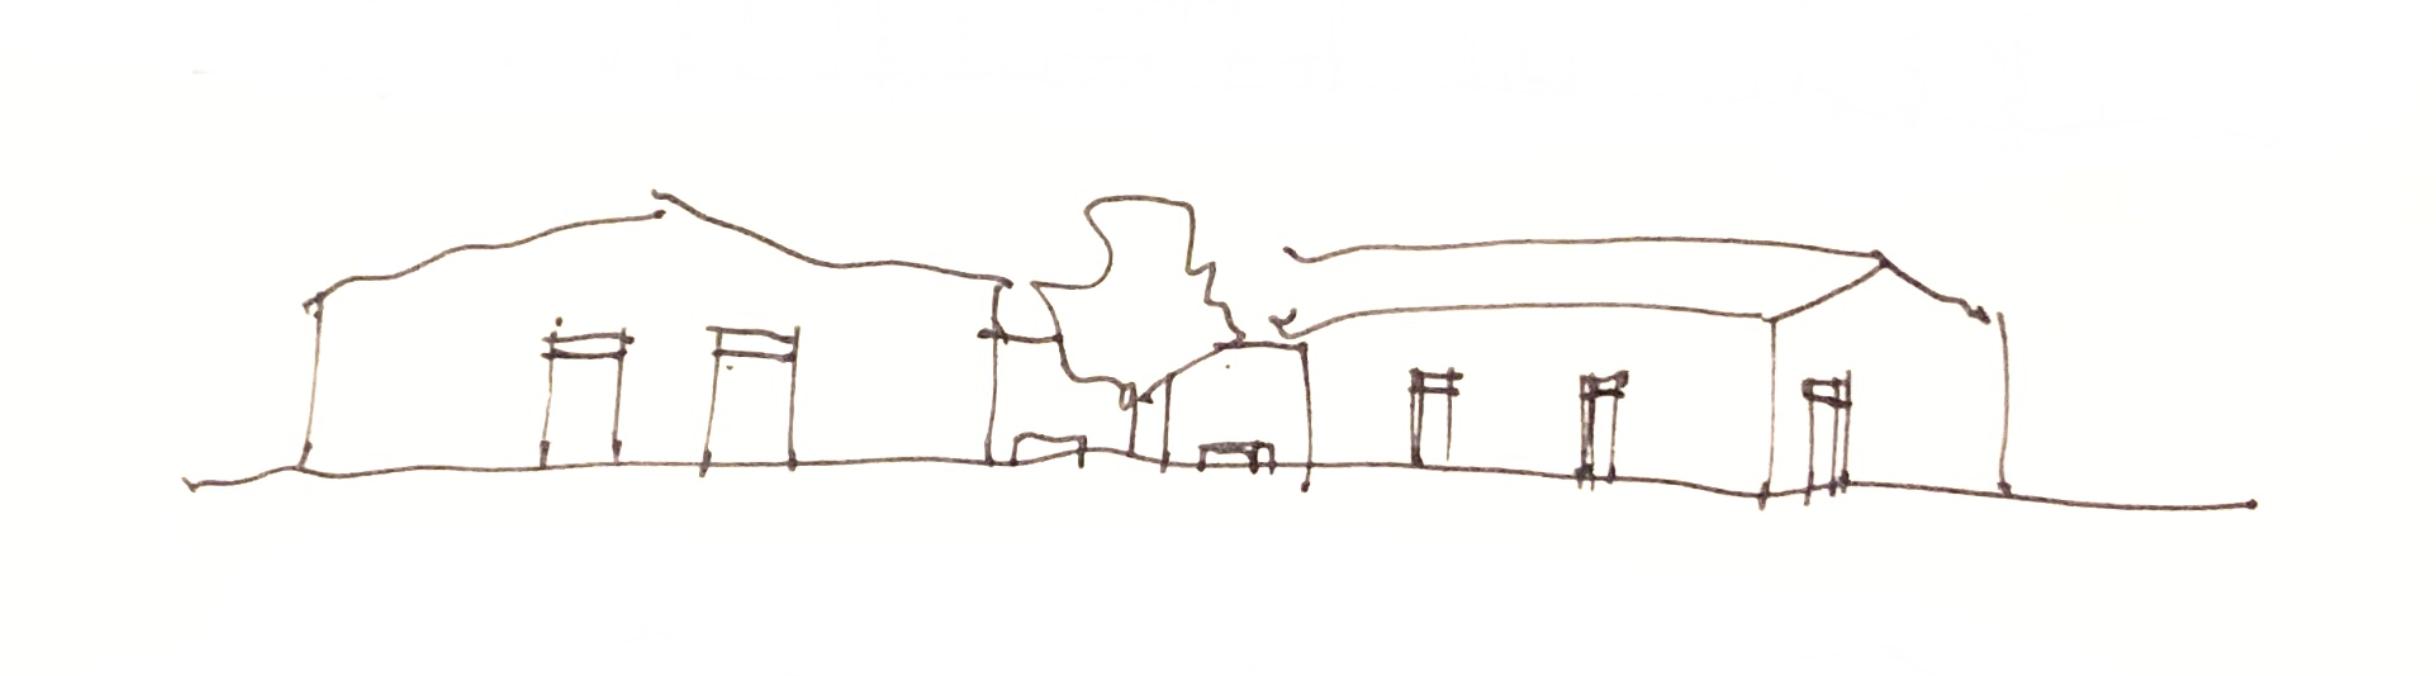 sketch2.png